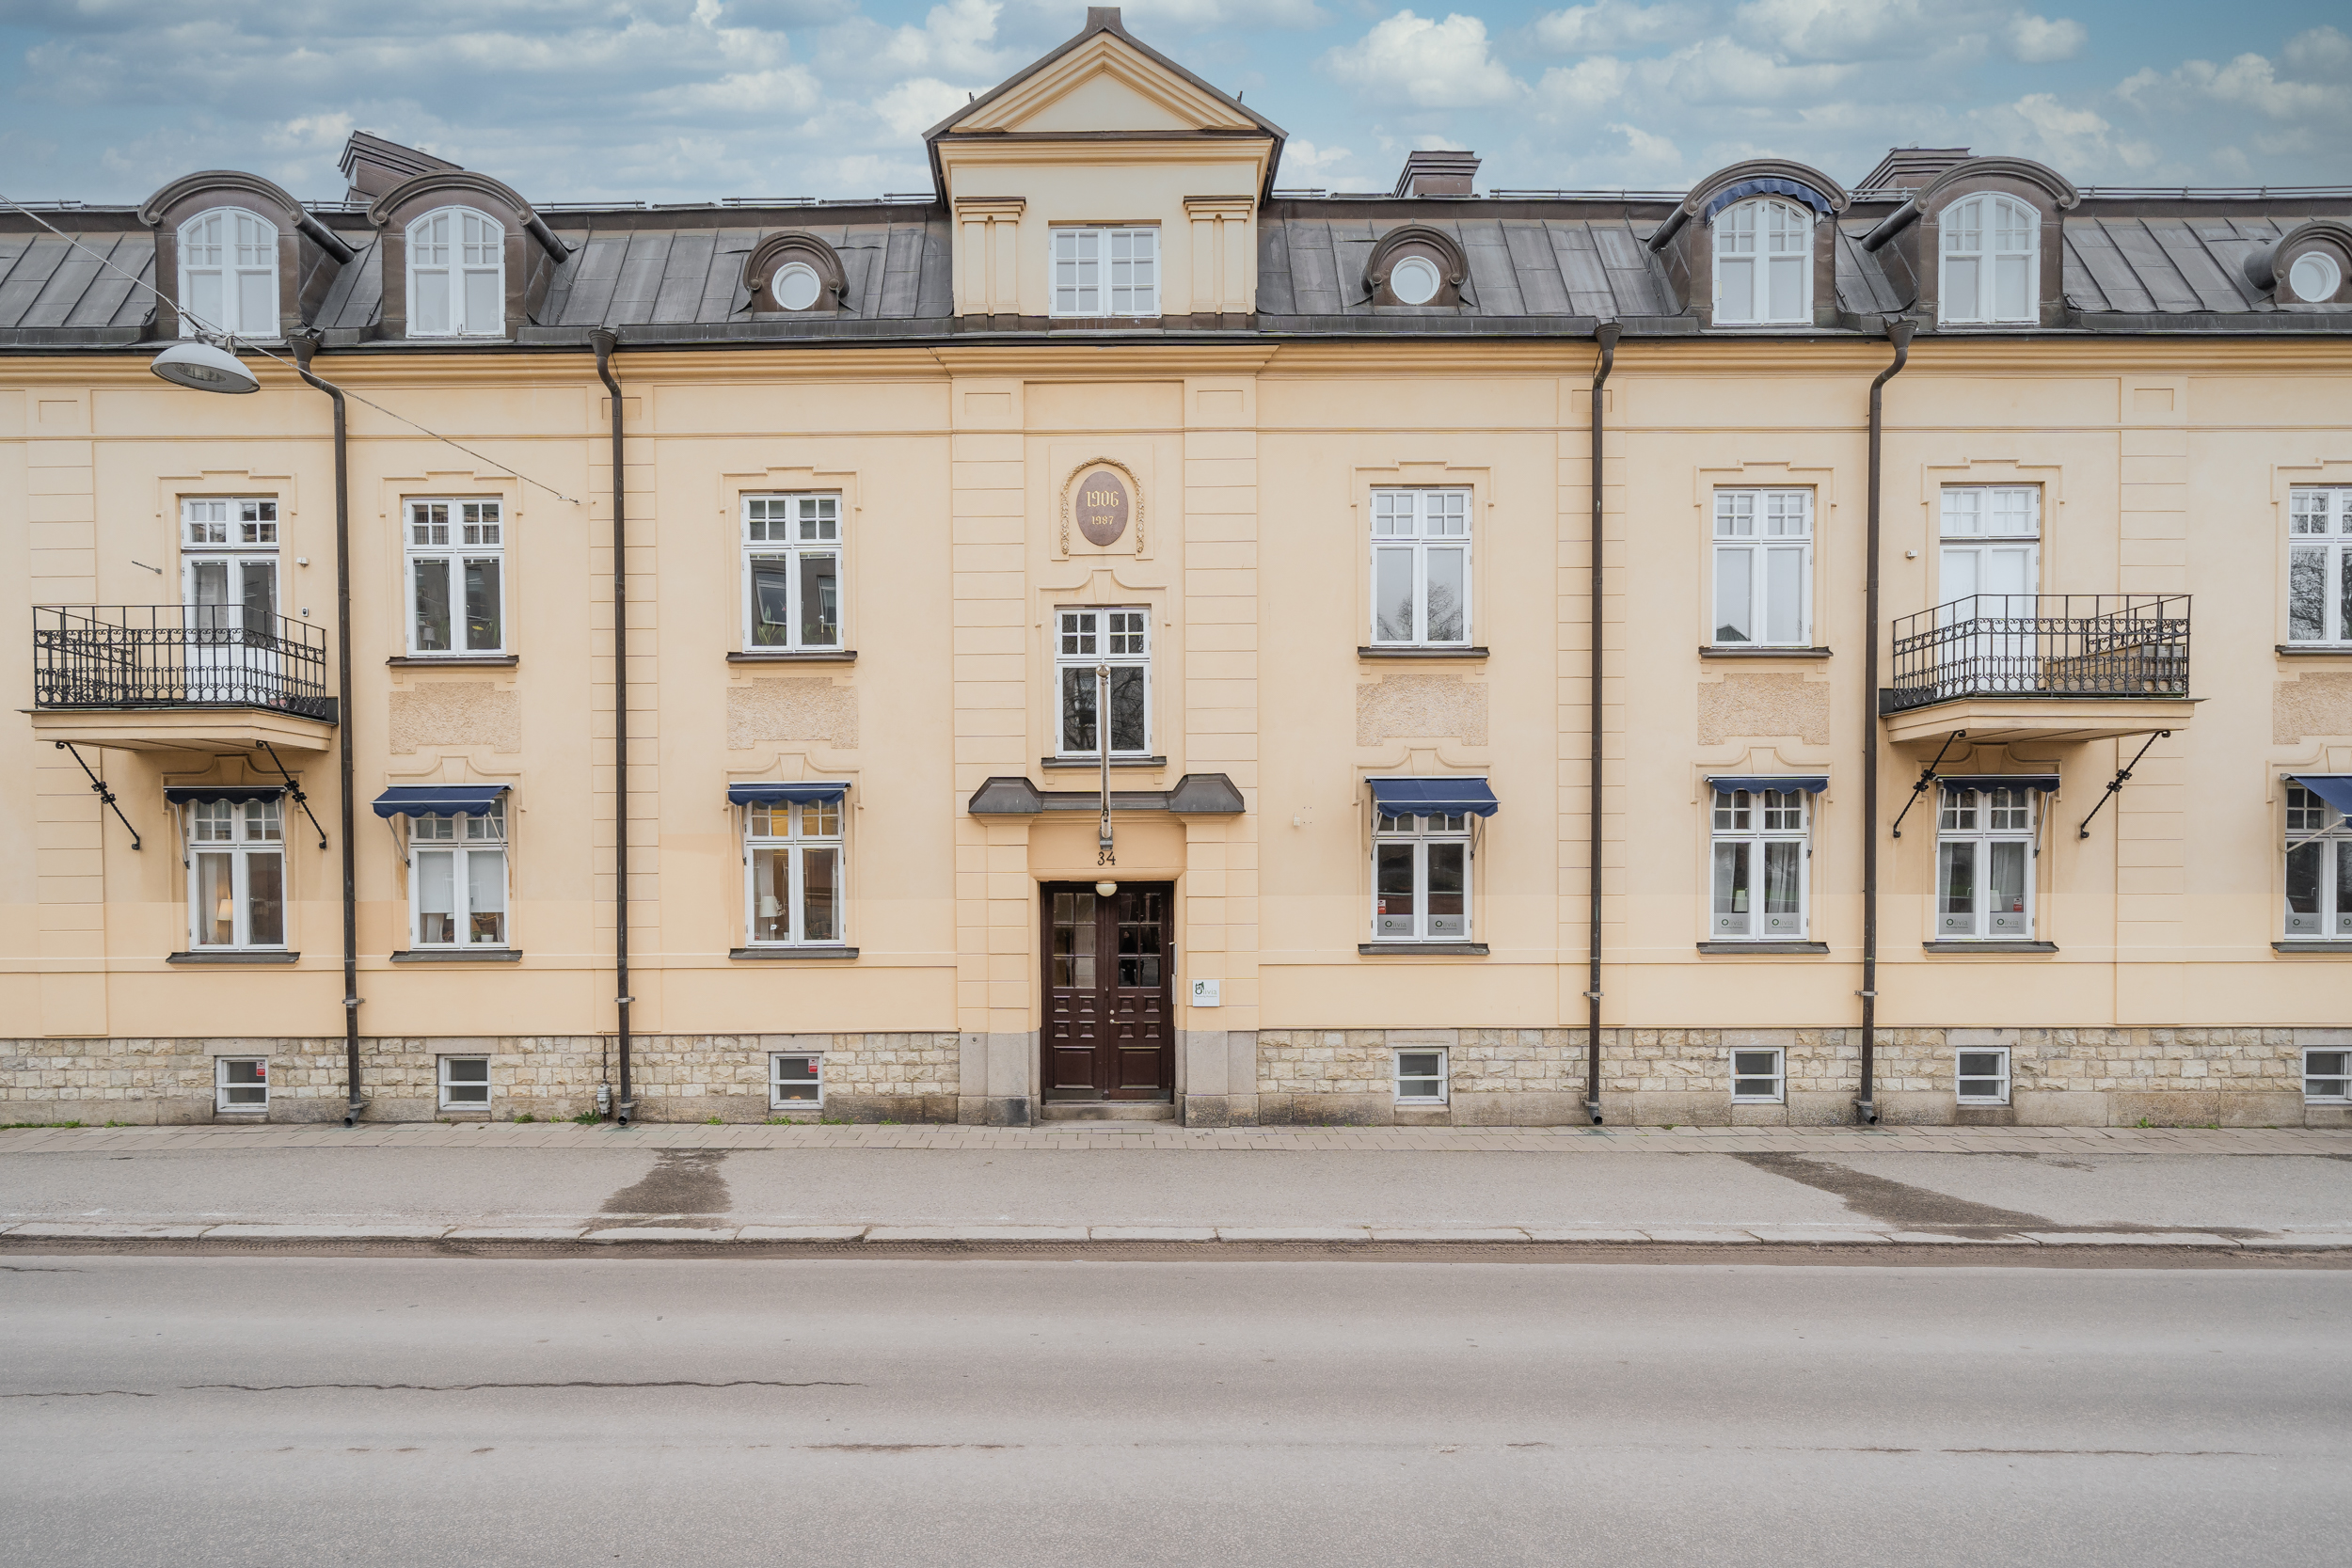 Vasagatan 34, Västerås